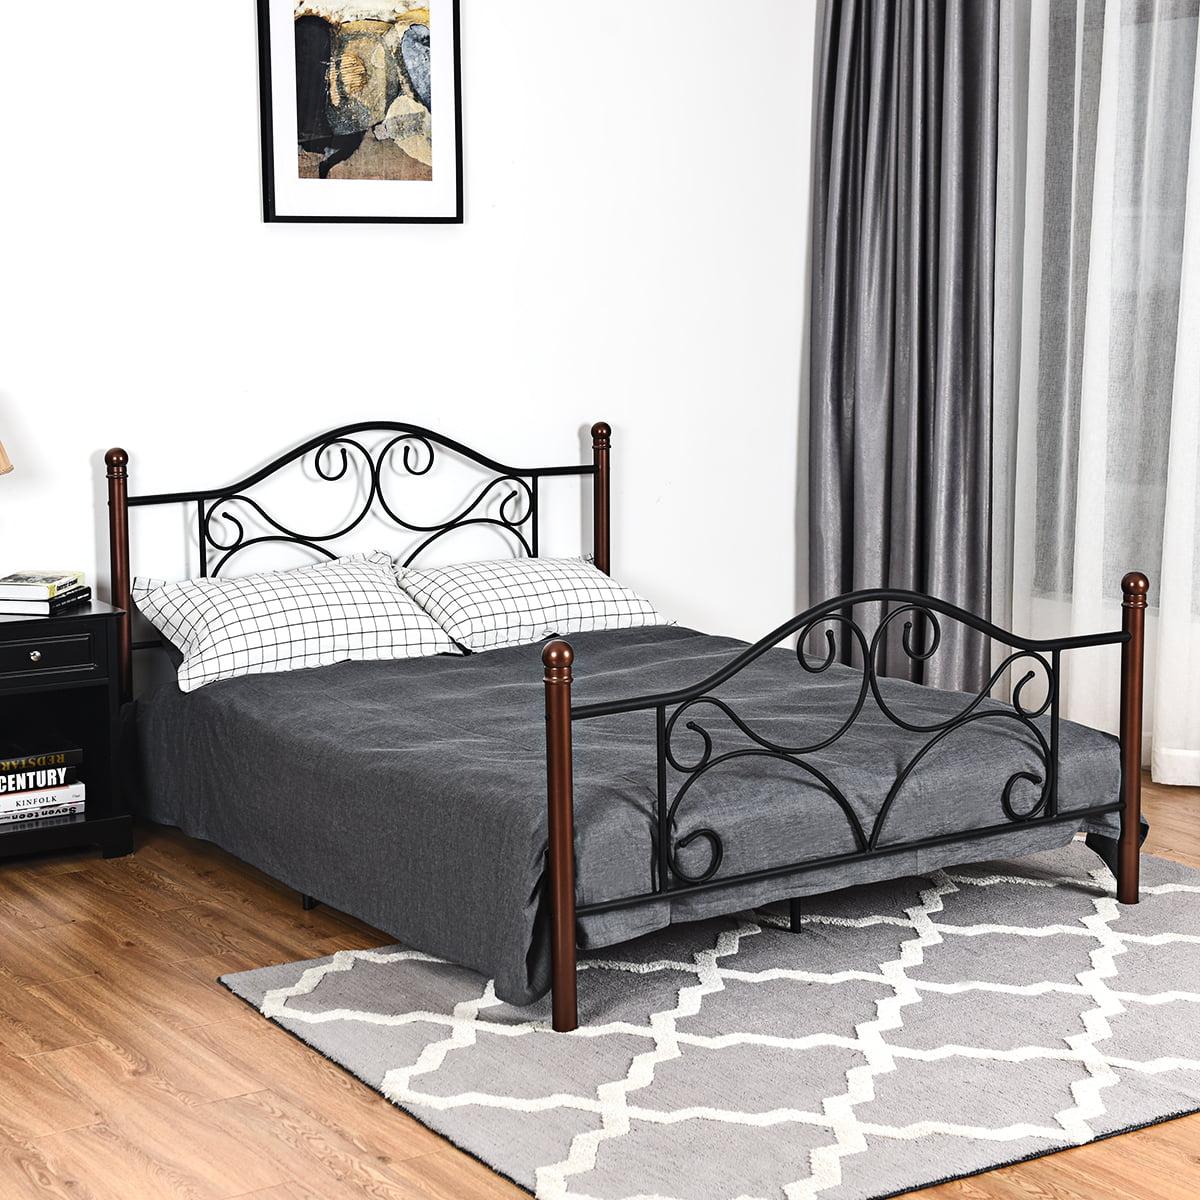 069ef63bd097 Queen Size Steel Bed Frame Platform Stable Metal Slats Headboard Footboard  Black | Walmart Canada